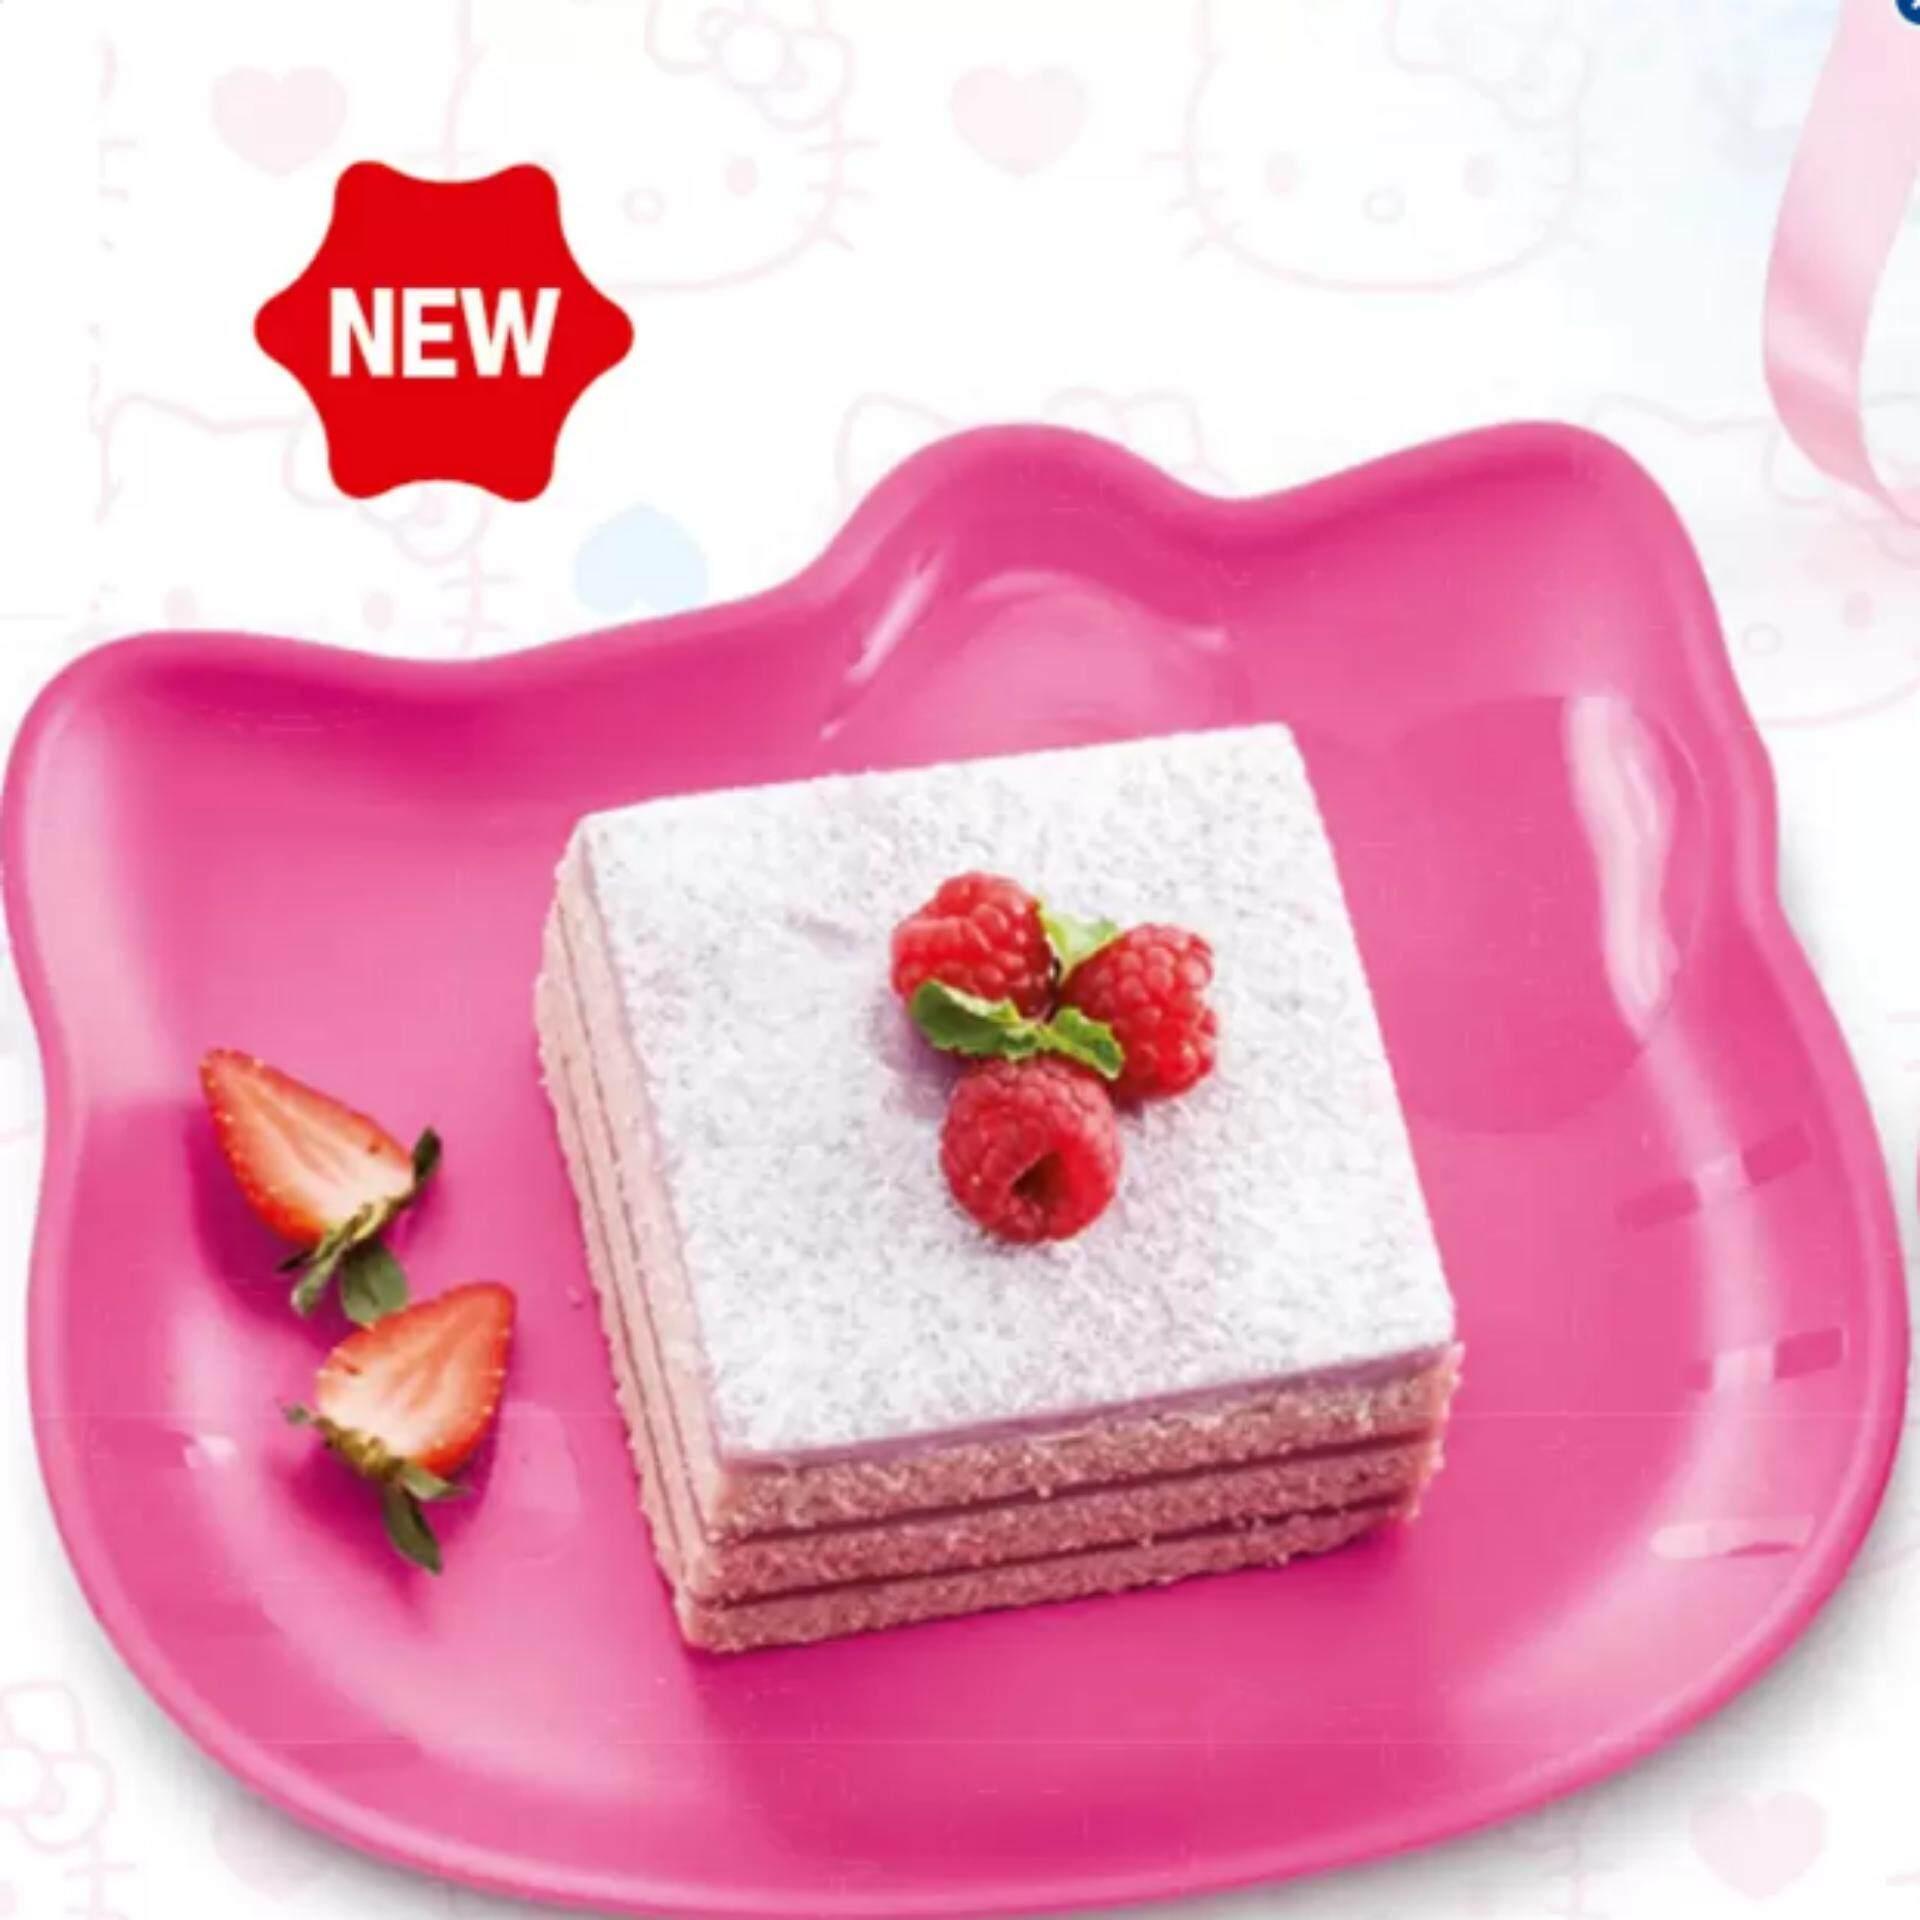 Tupperware Hello Kitty Plate (1) pc only - Random Color Send